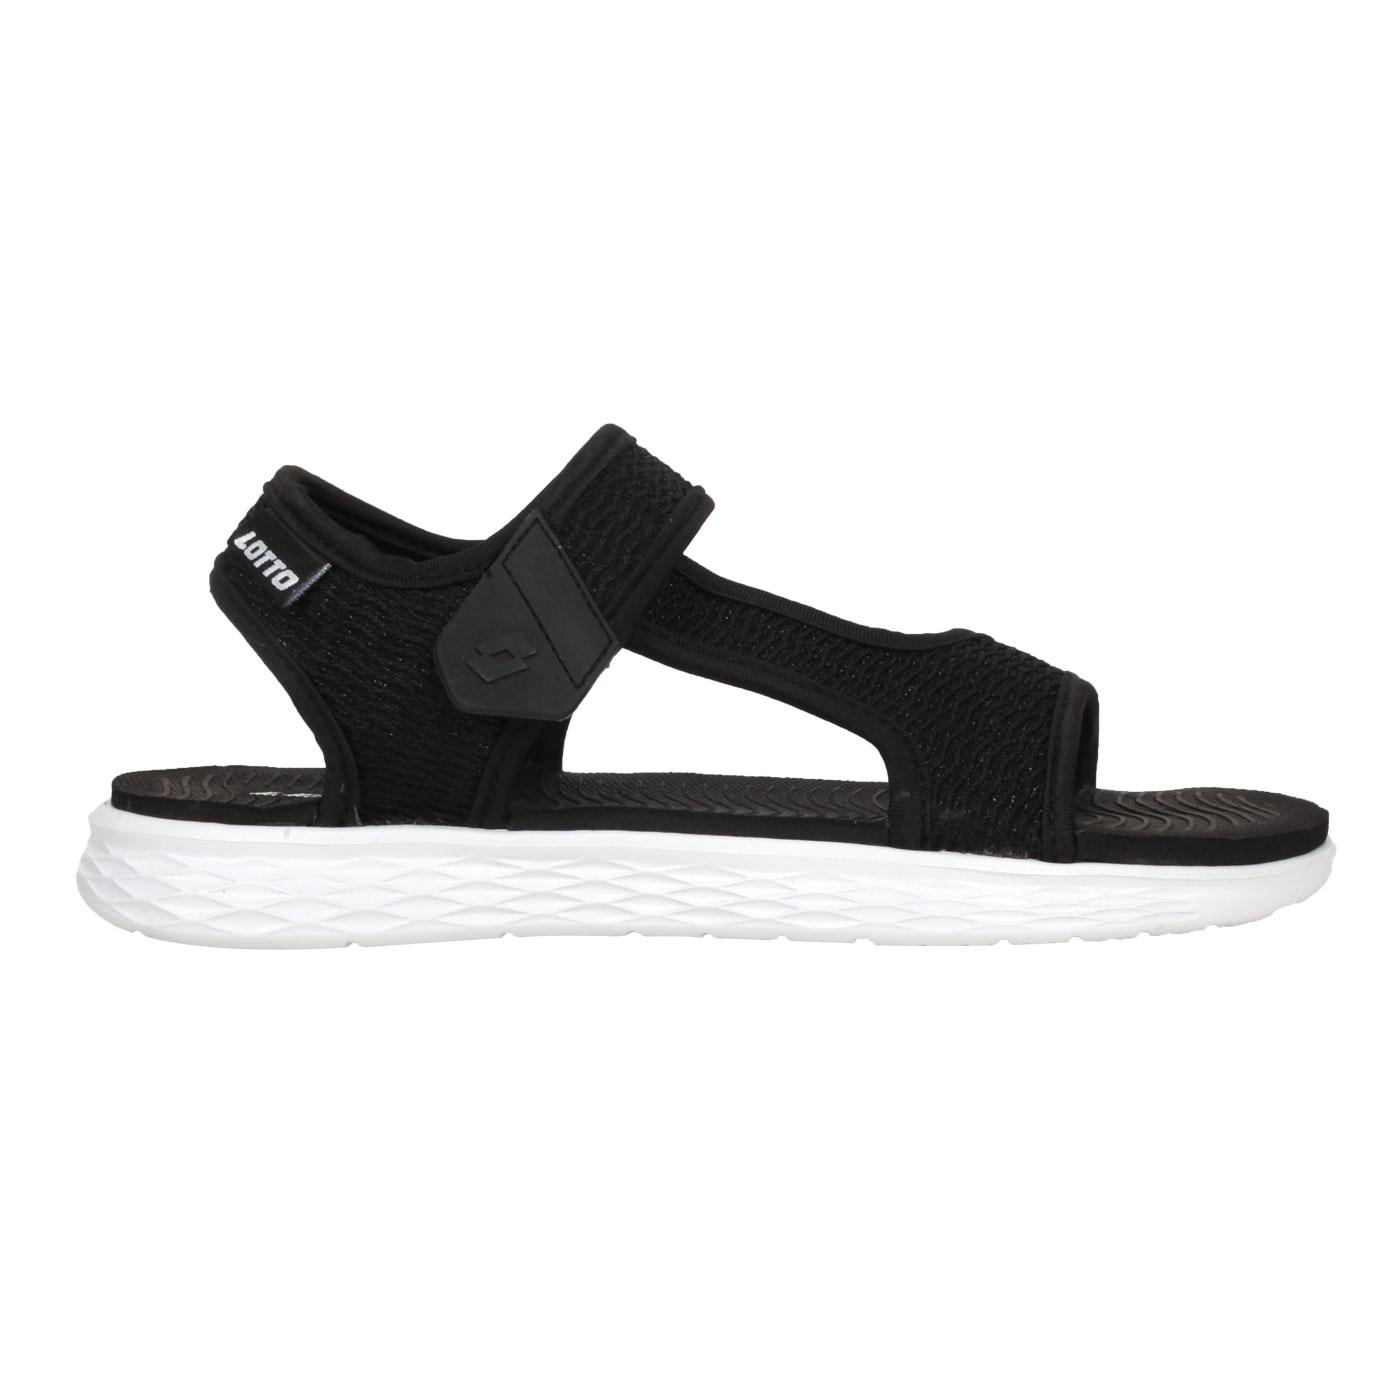 LOTTO 女款輕量涼鞋 LT1AWS3371 - 黑白